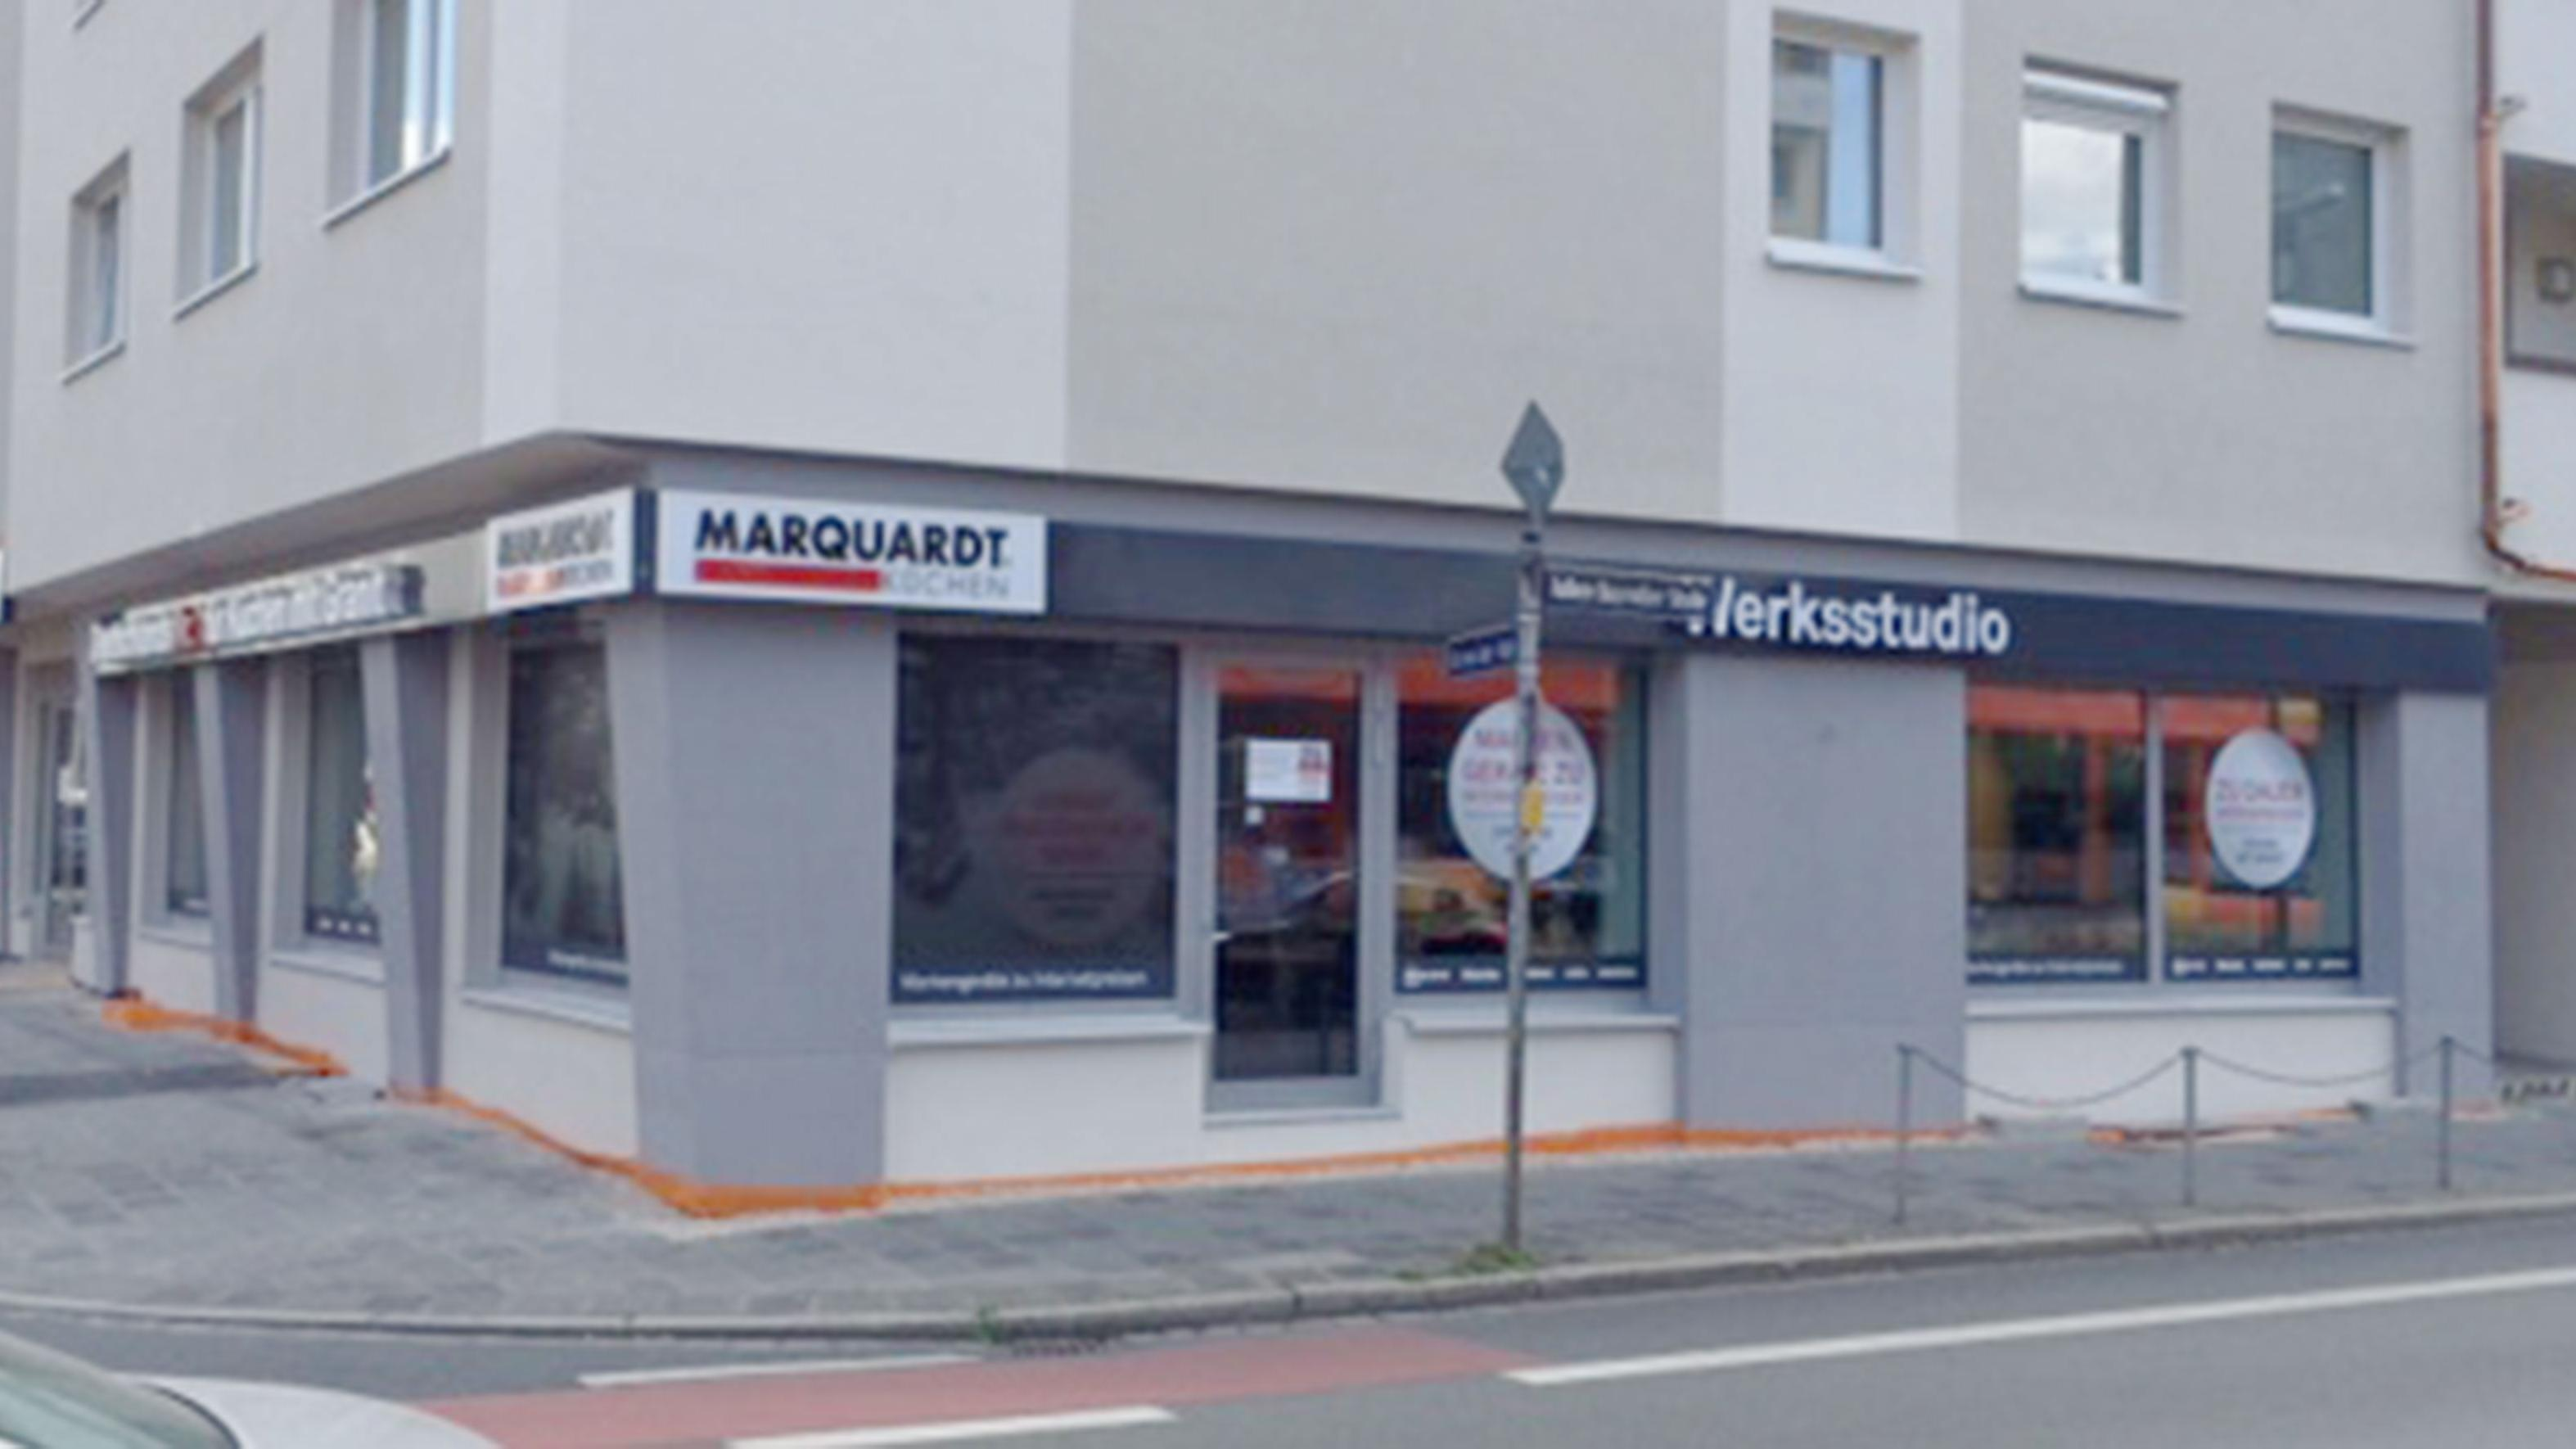 Marquardt Küchen • Nürnberg, Äußere Bayreuther Straße 72 ...